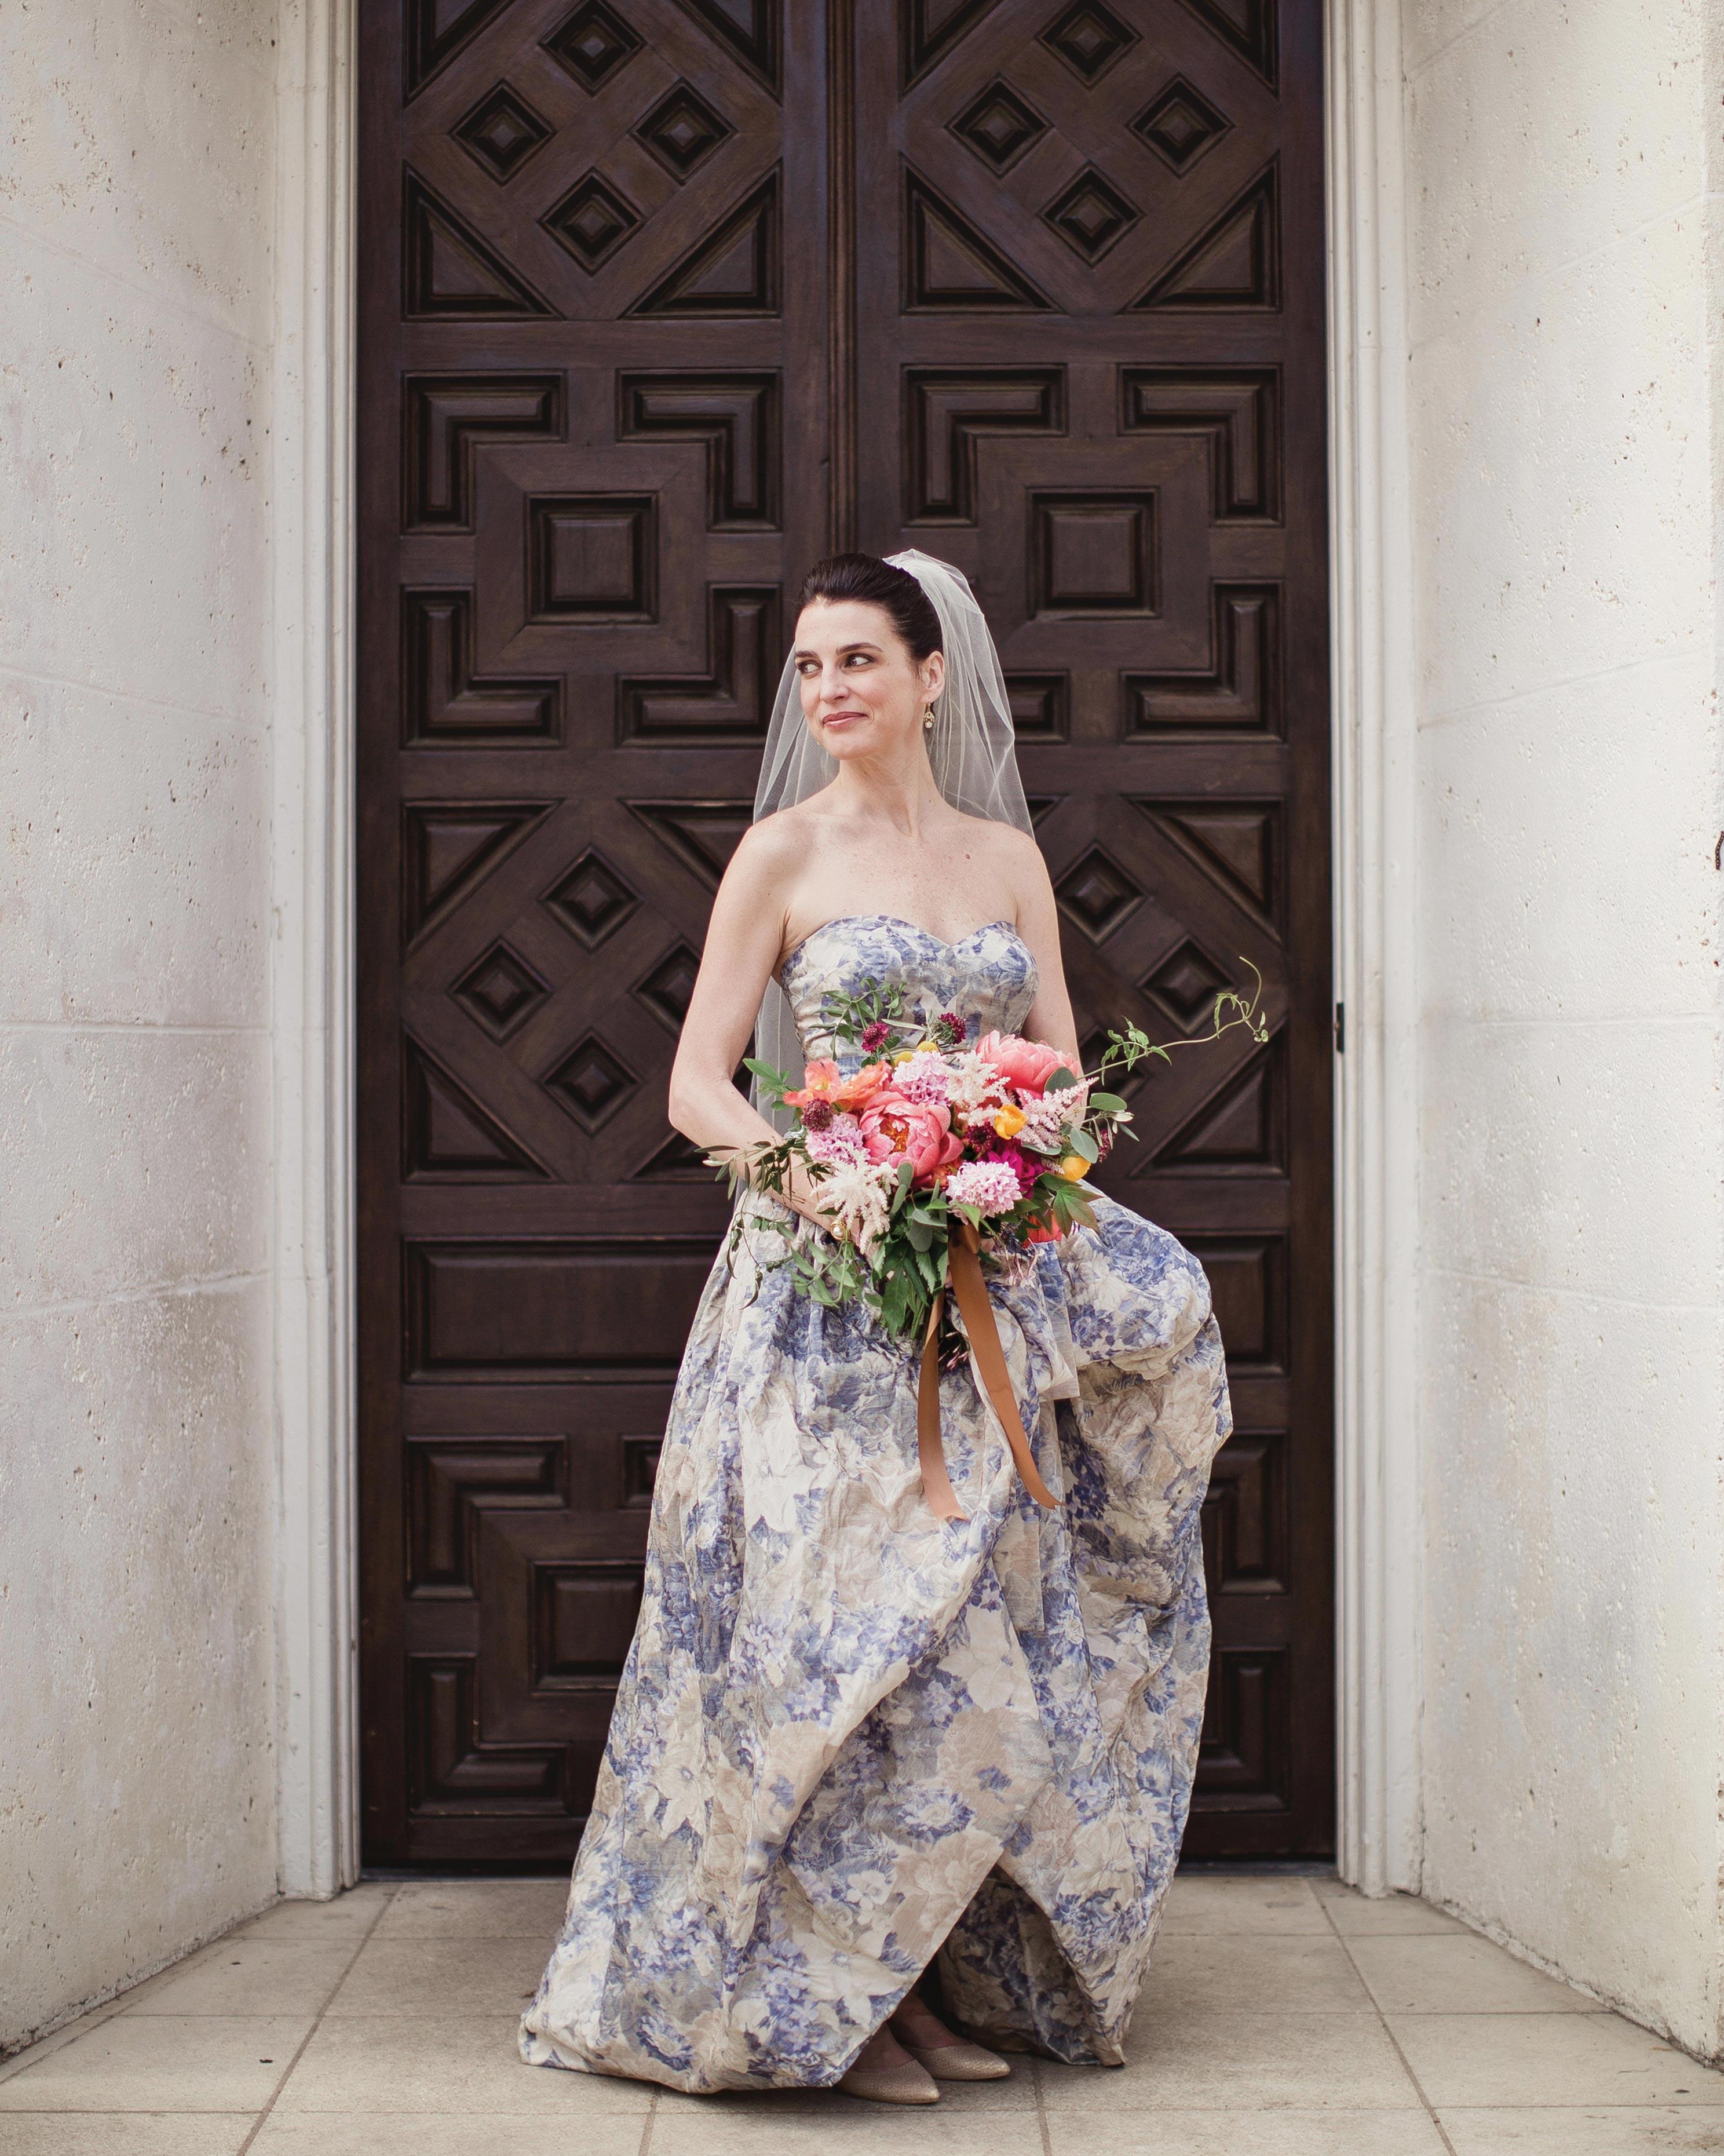 tara-dan-wedding-texas-dress-011-s112848.jpg